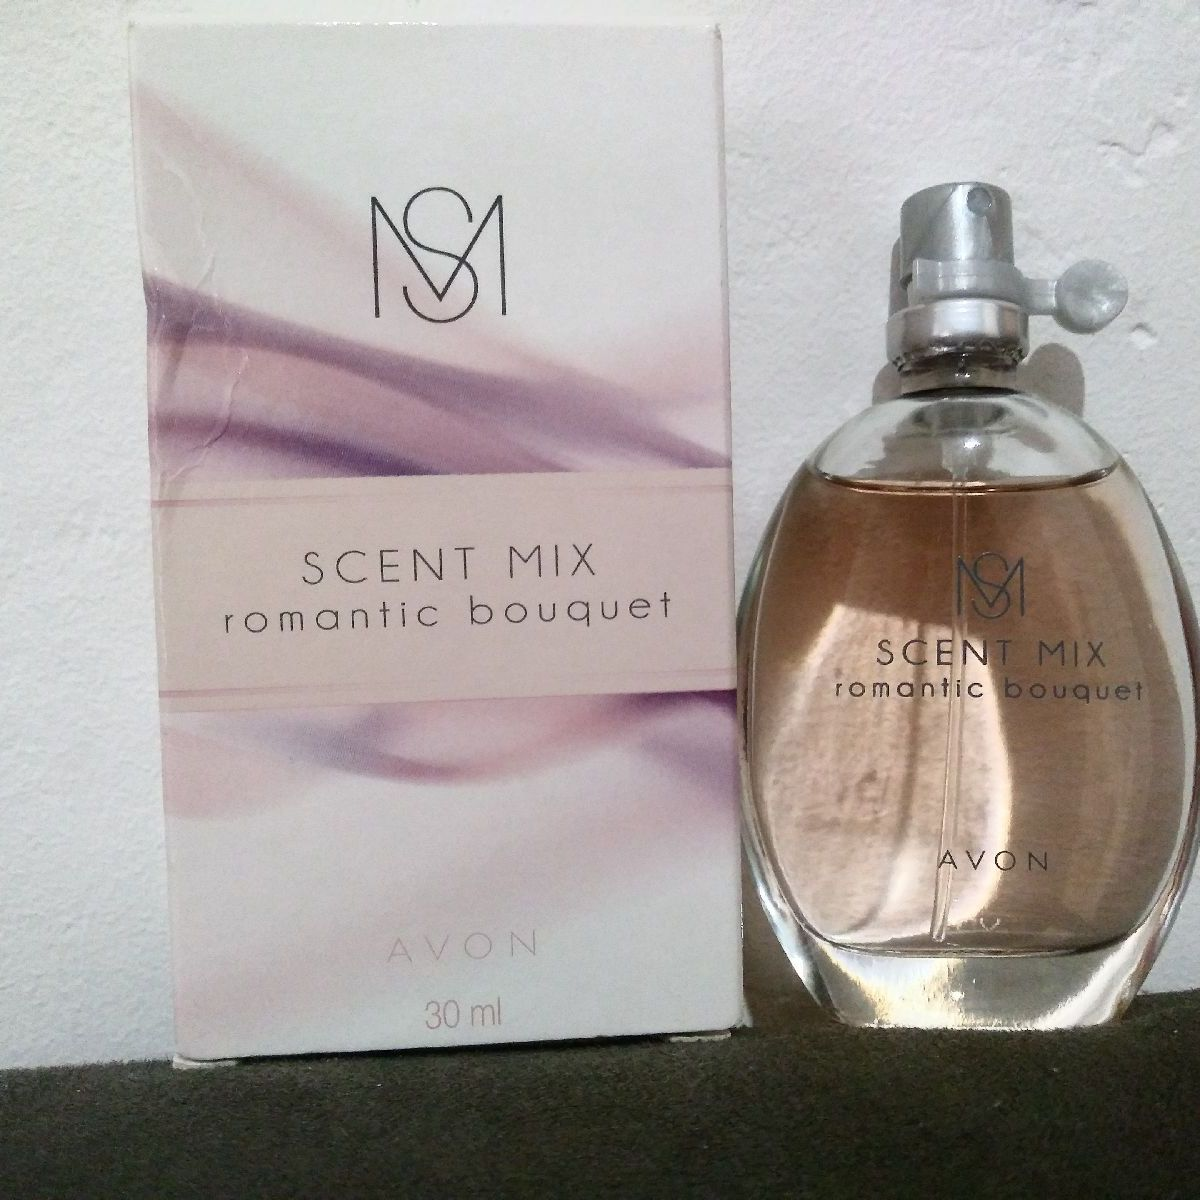 Avon Scent Mix Romantic Bouquet Perfume Feminino Avon Usado 35970672 Enjoei